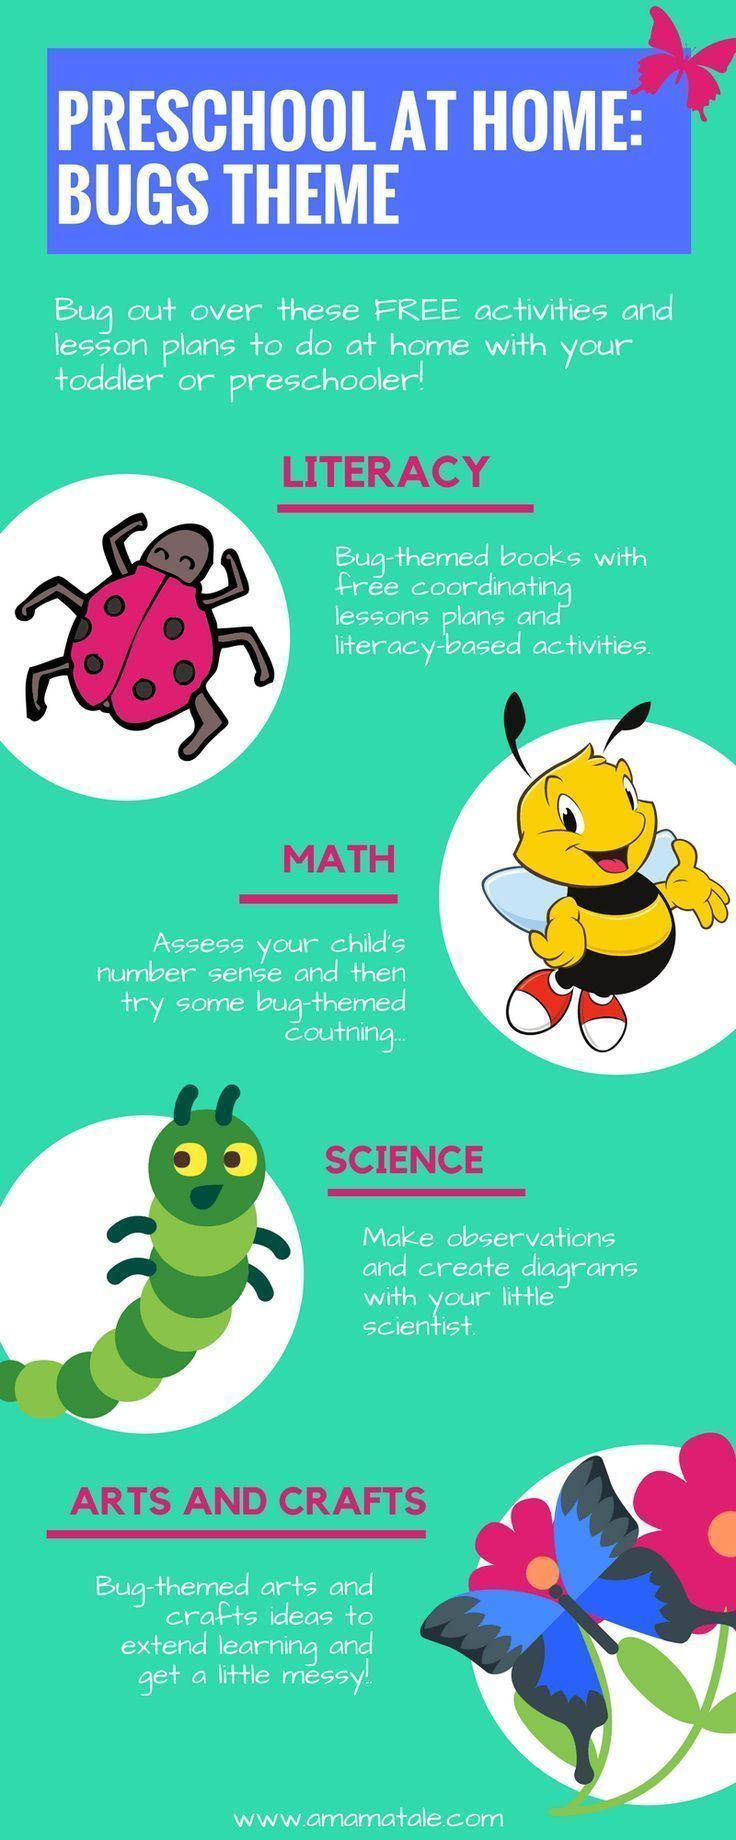 Bugs Theme Preschool At Home